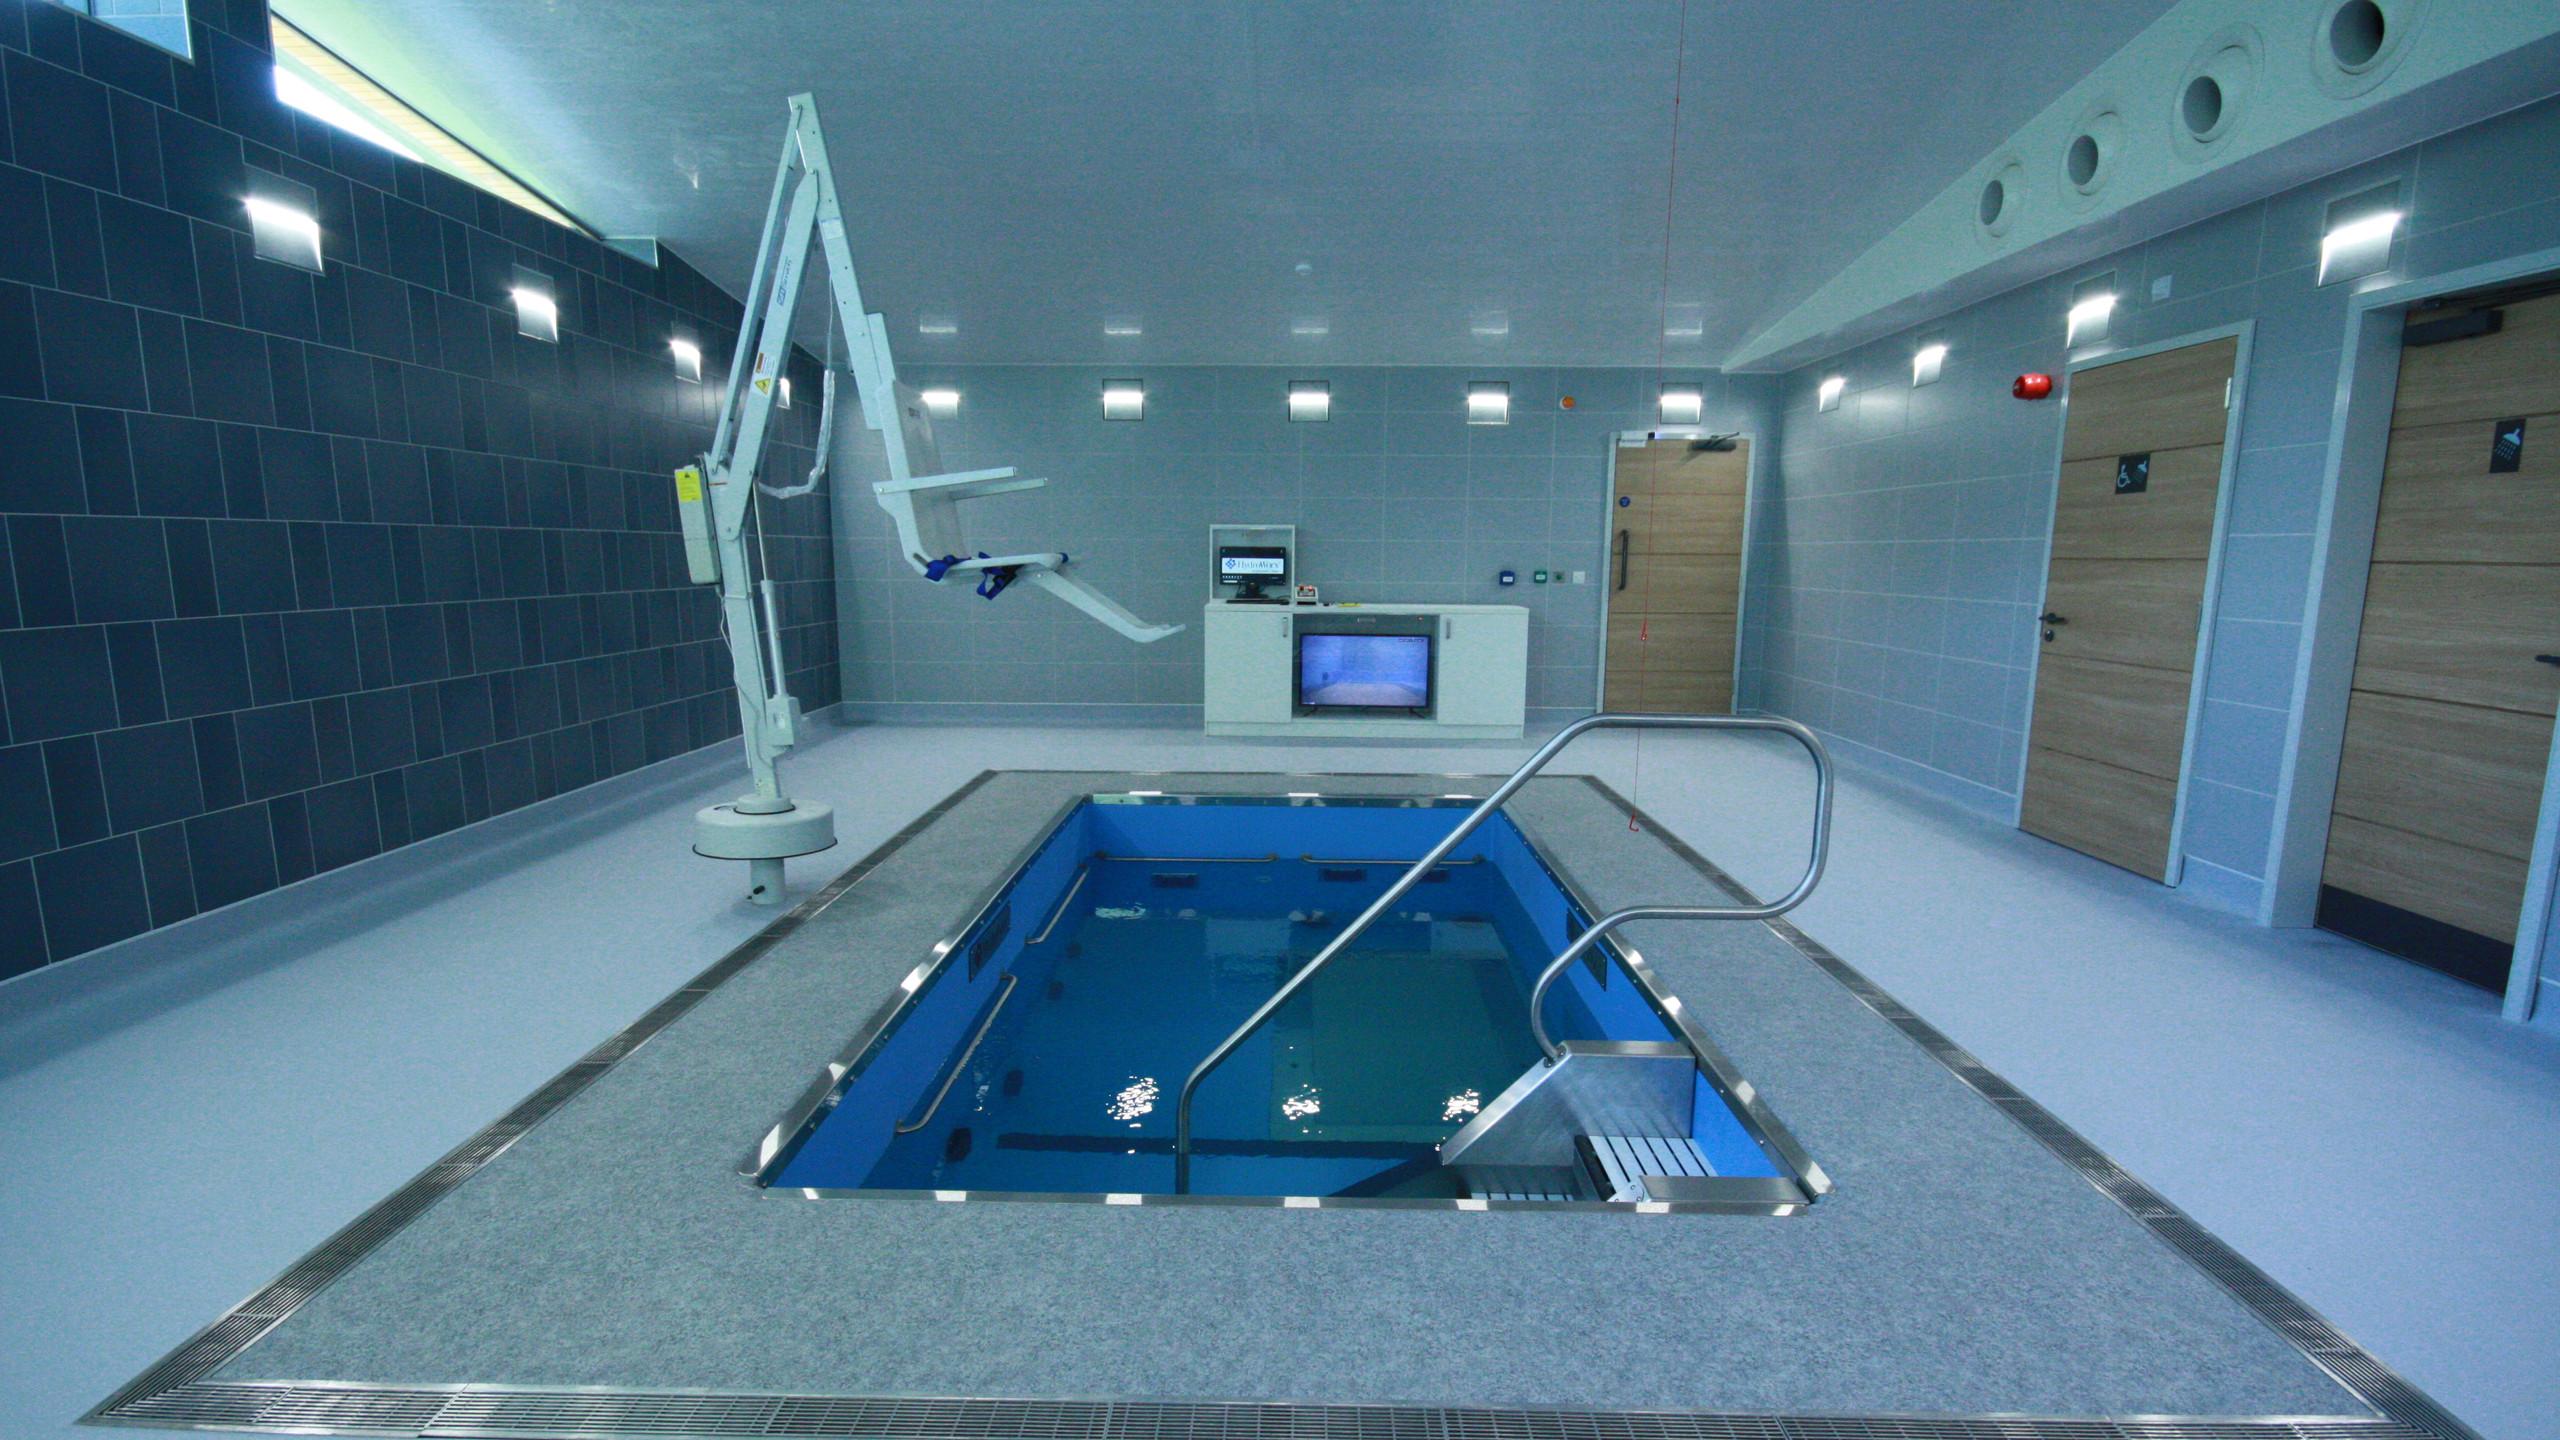 Underwater Treadmill Pool